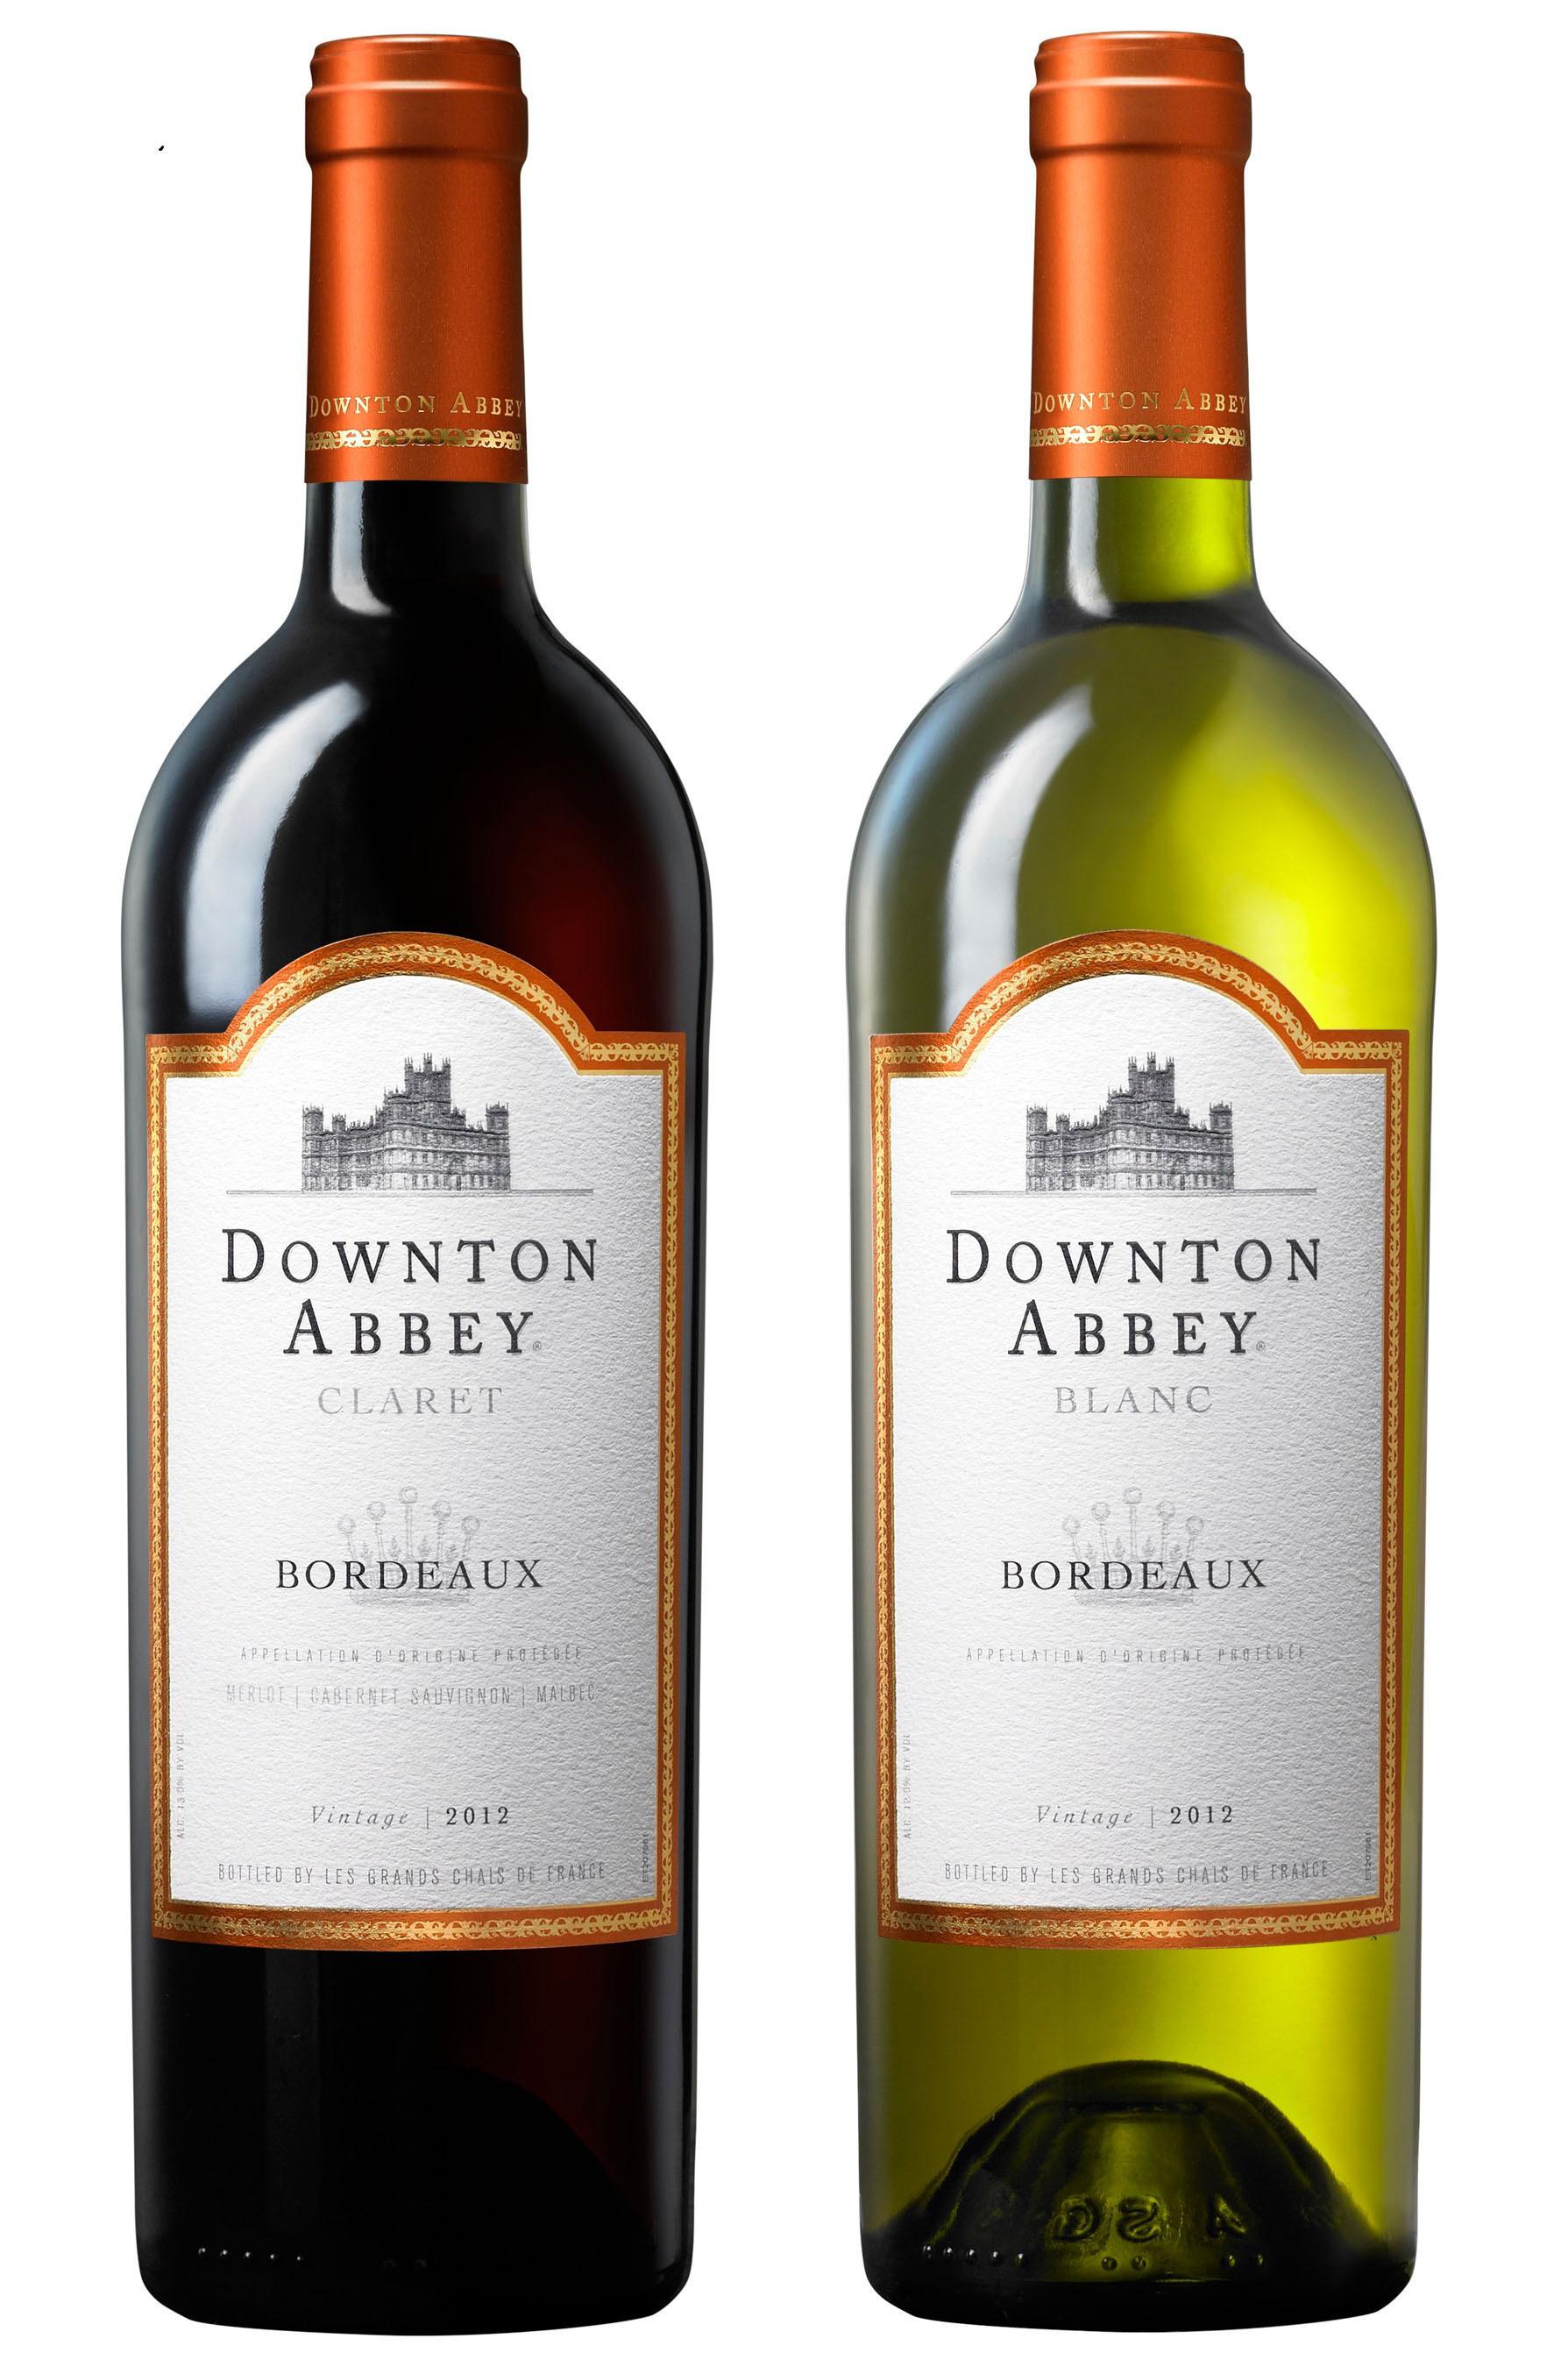 Downton Abbey Wines Launch Bordeaux Collection